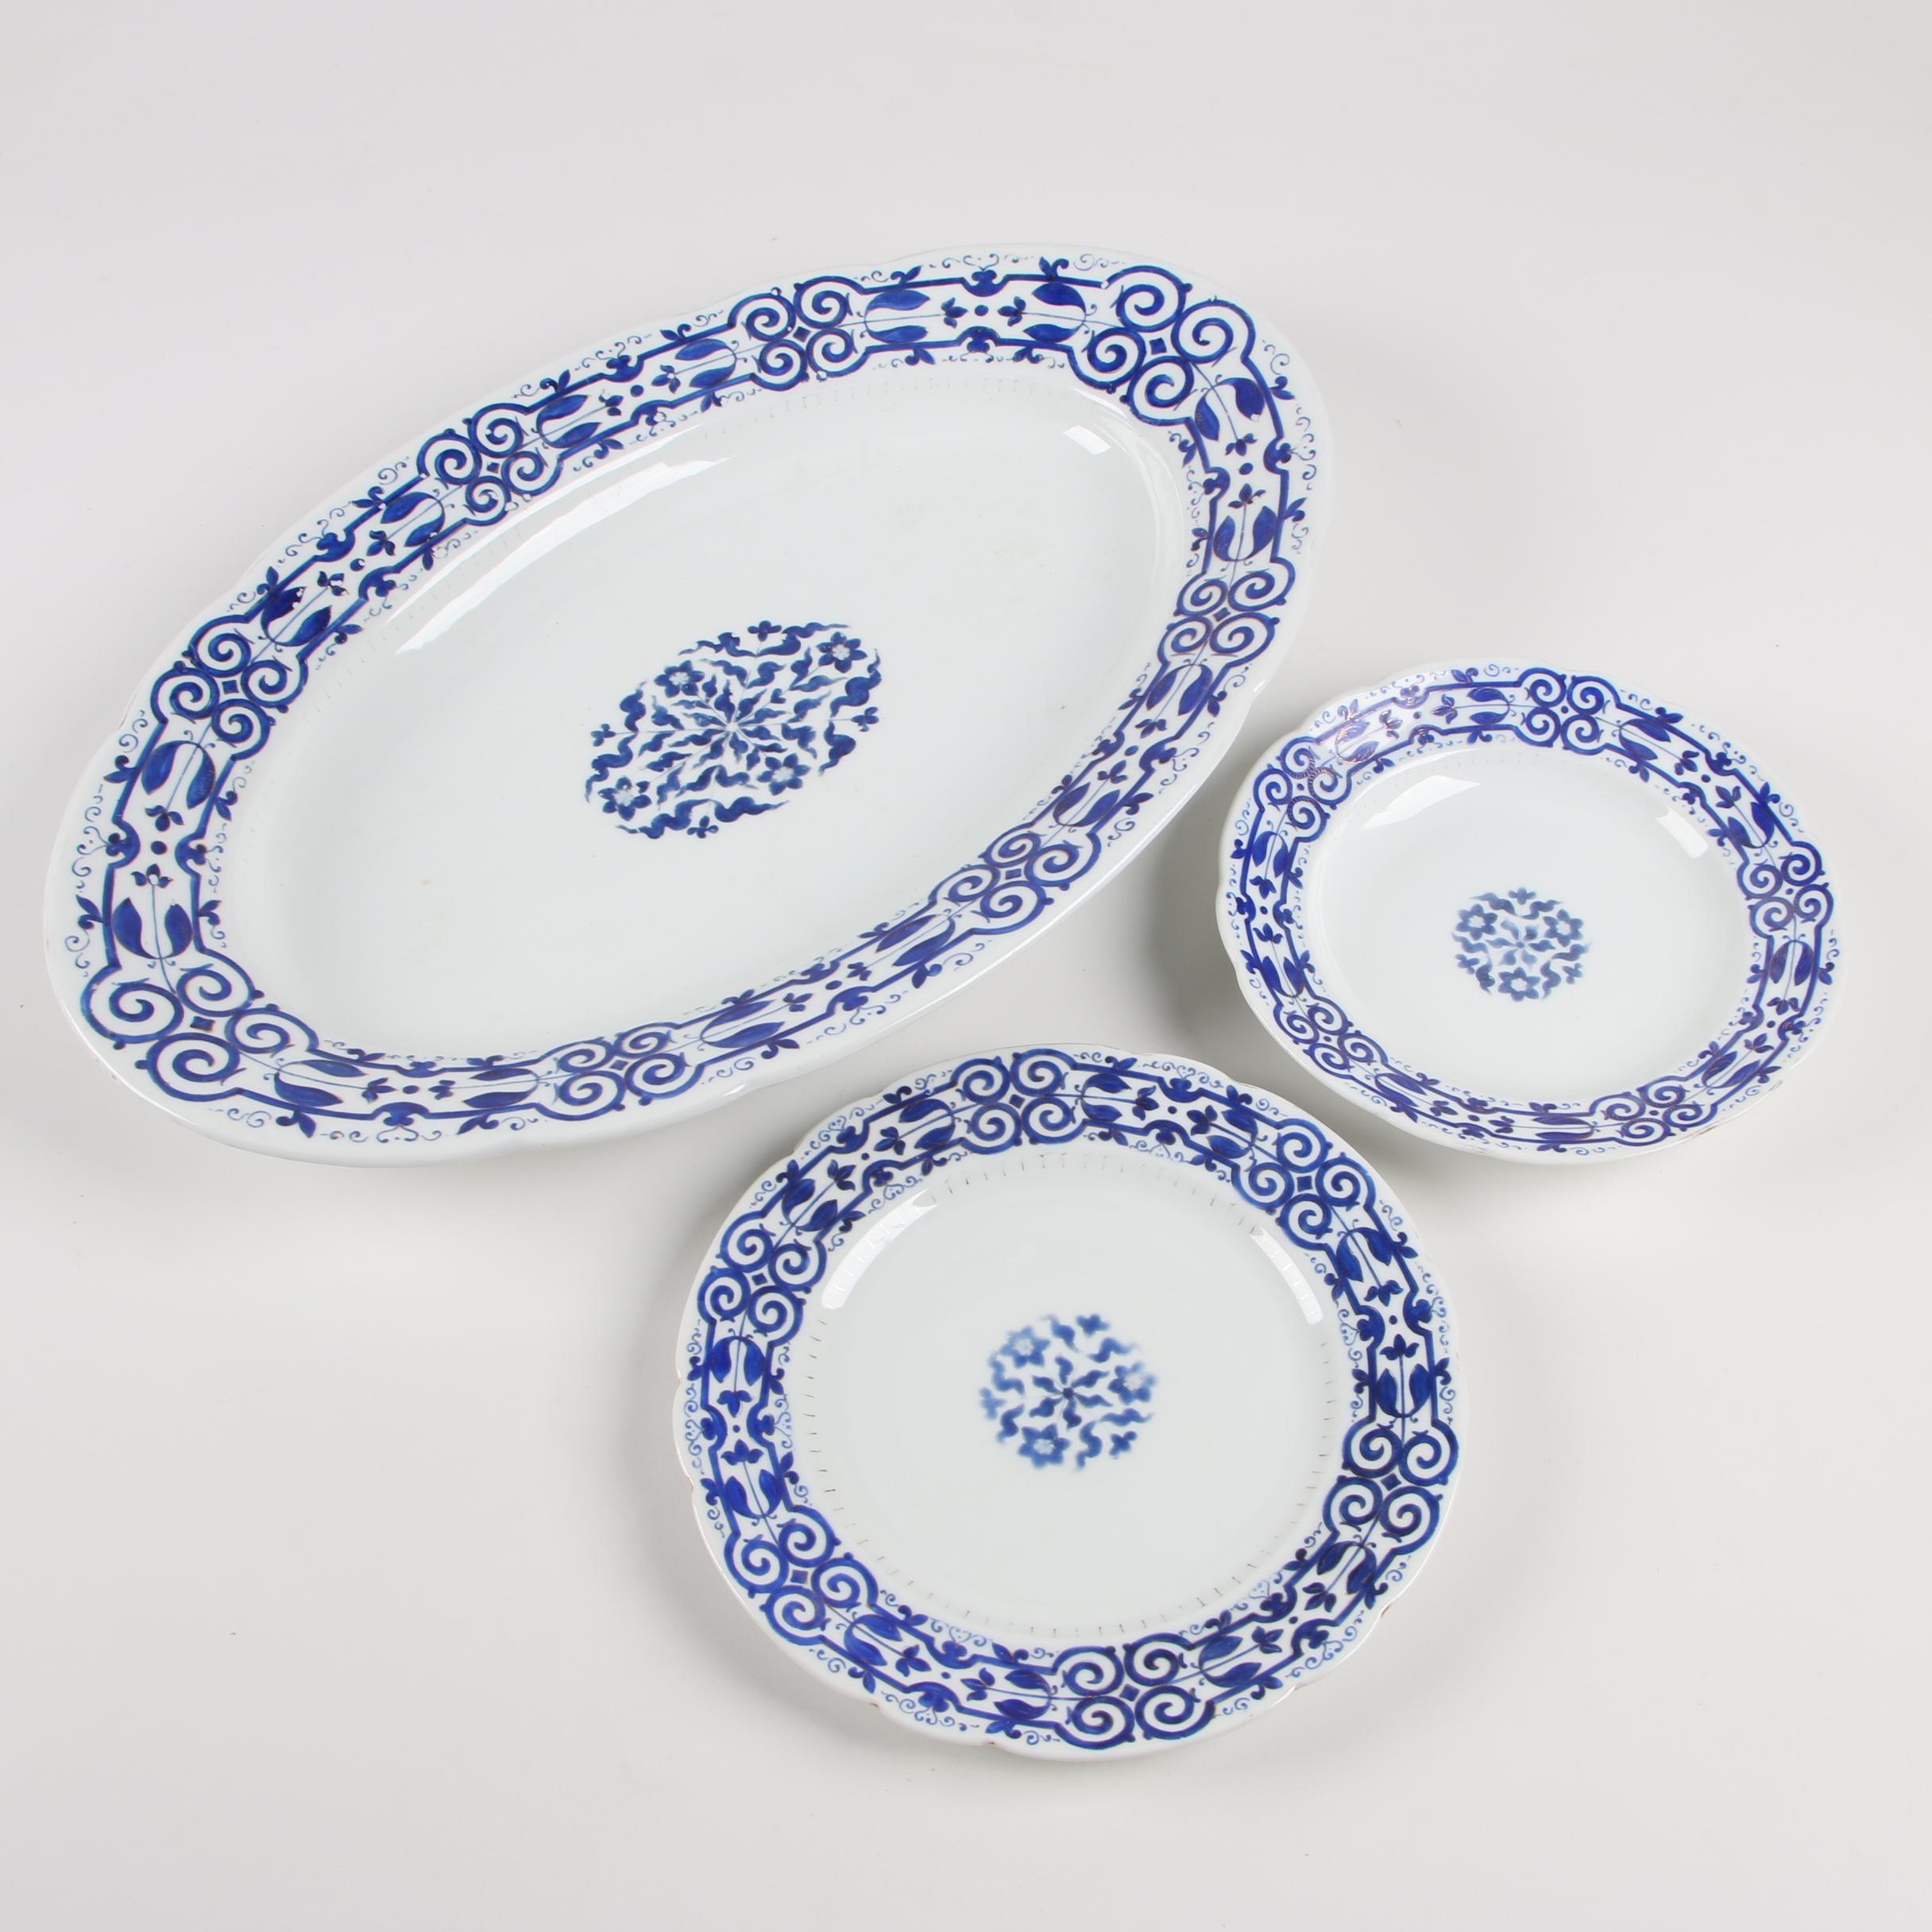 Fischer & Mieg  Porcelain Tableware